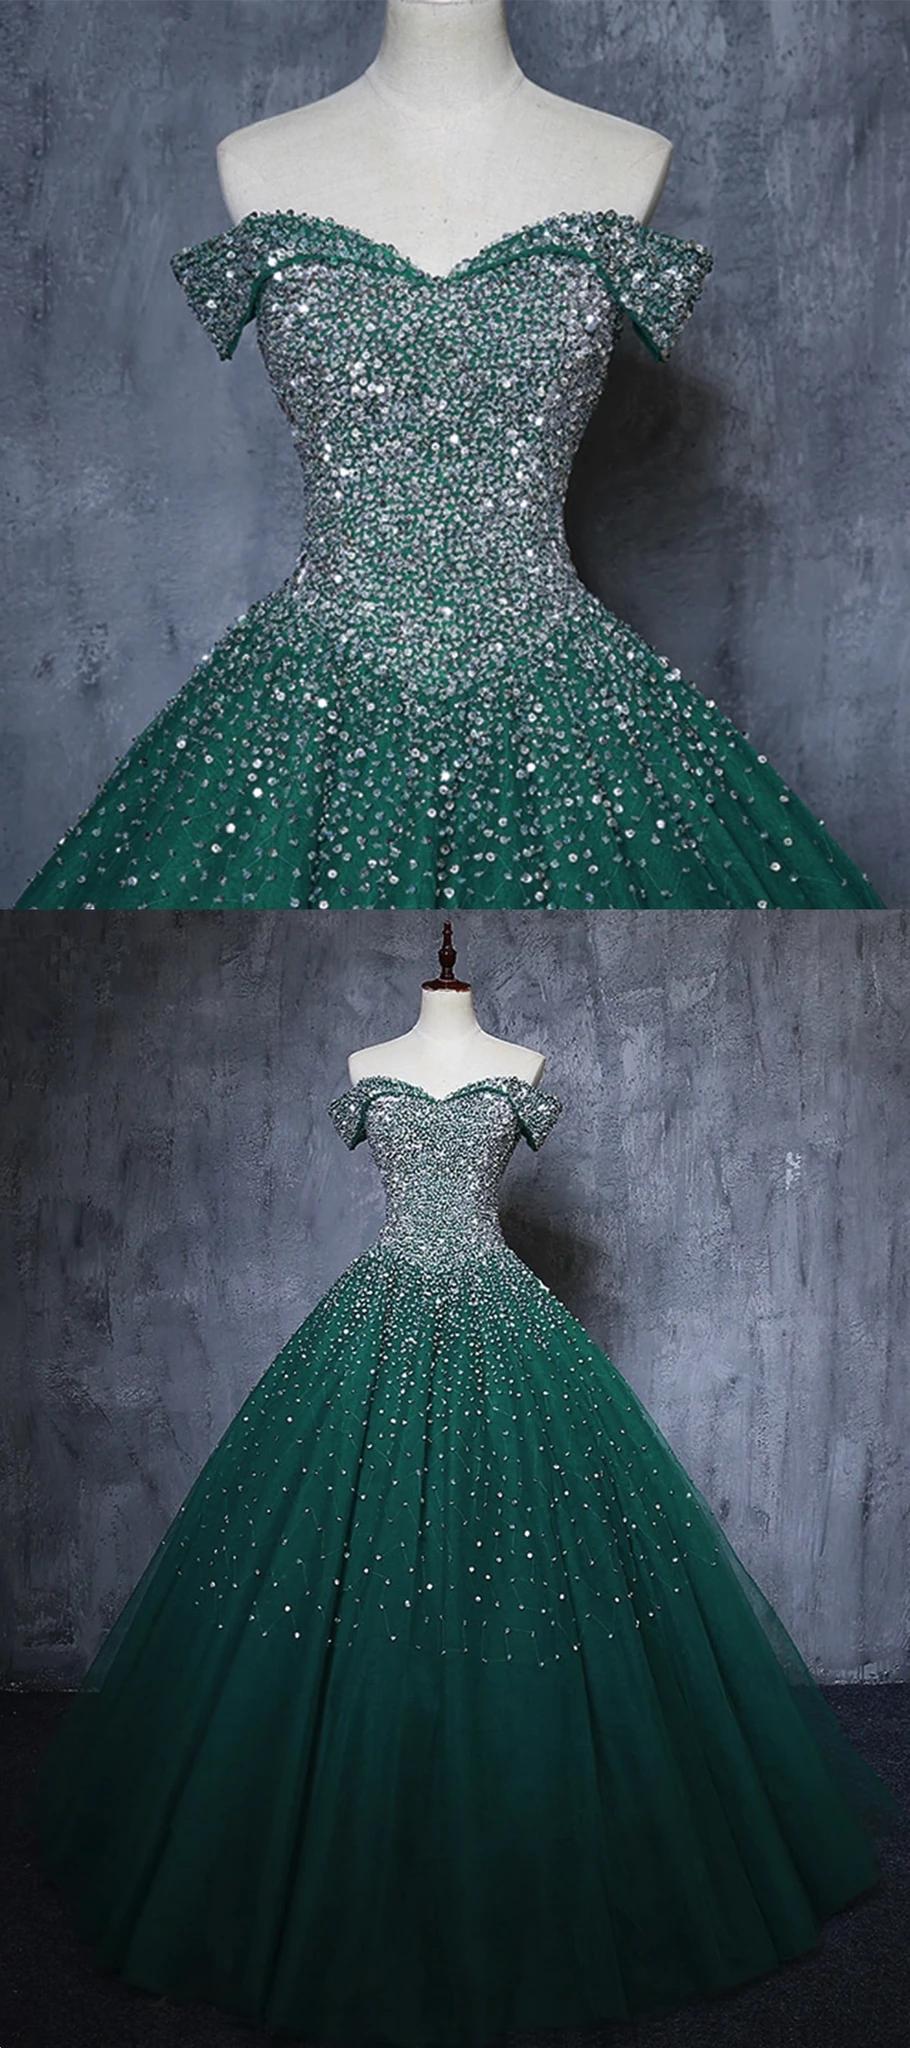 Dark Green Tulle Sweetheart Sparkle Party Dress Sweet 16 Dress Evening Dresses Long Prom Dresses Sweet 16 Dresses [ 2048 x 910 Pixel ]